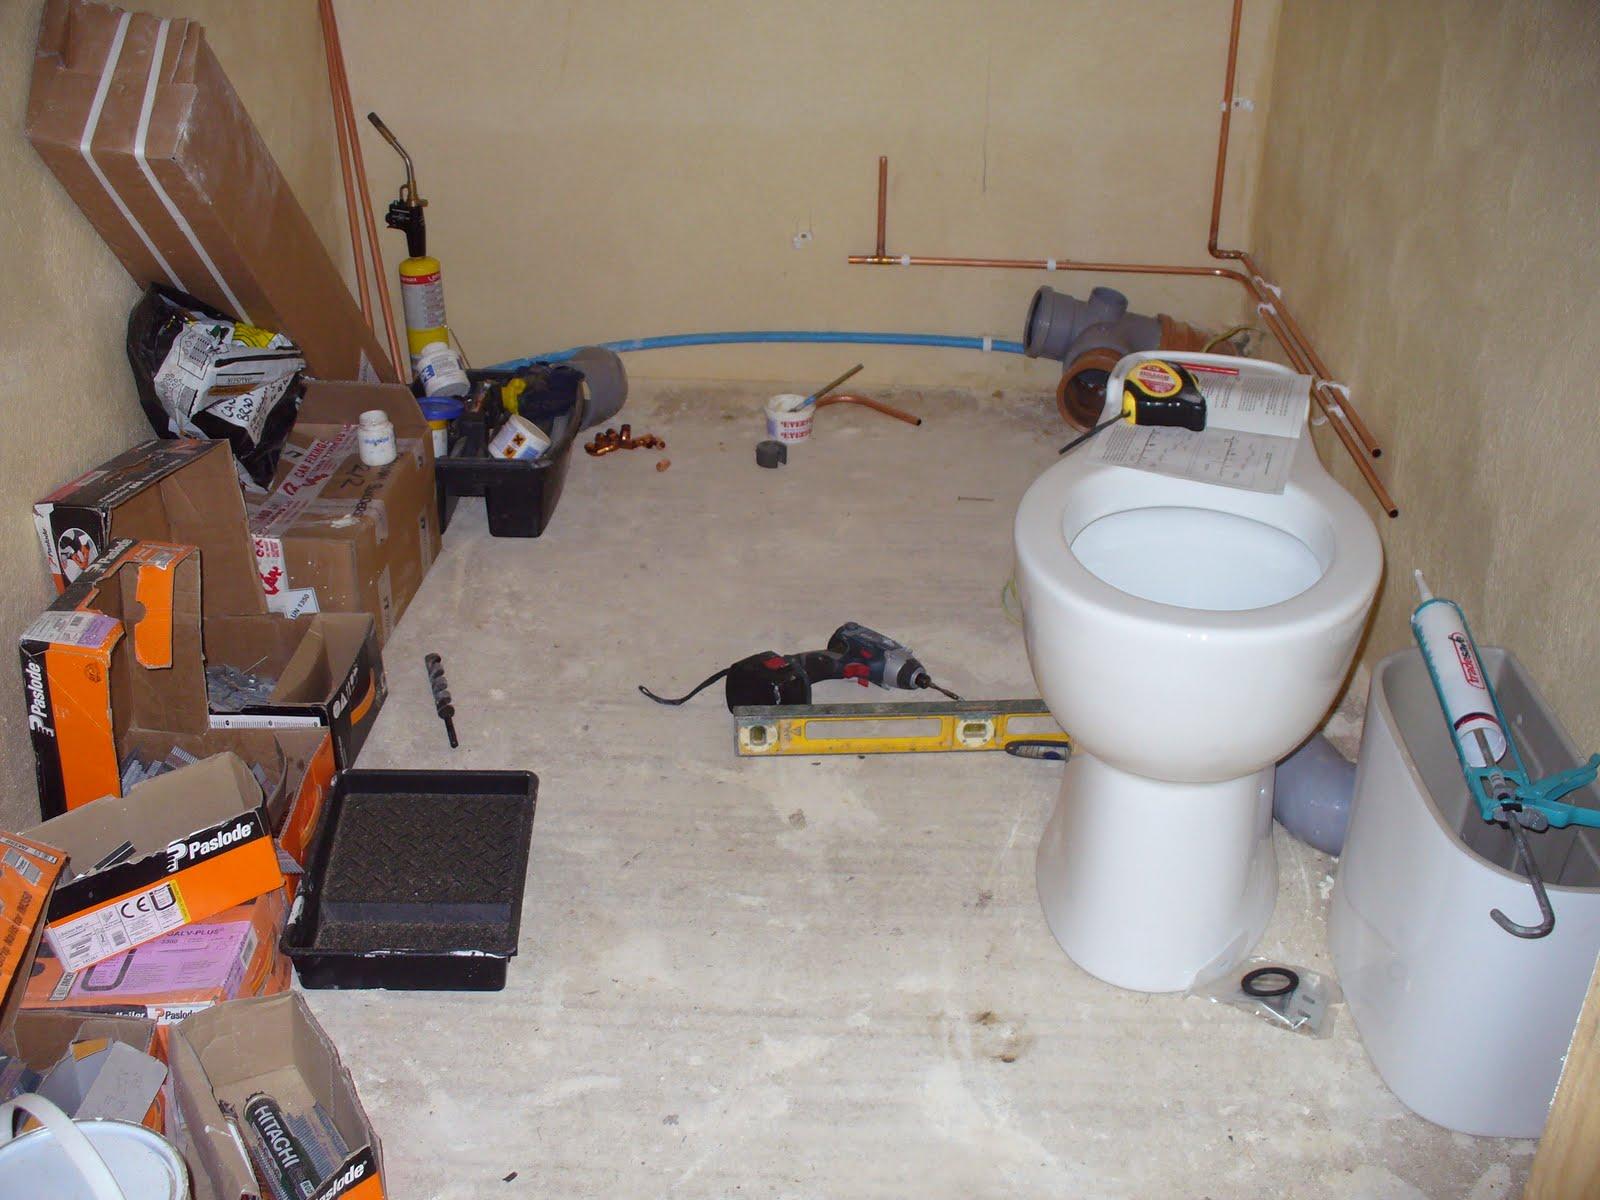 Access Electric Heating Plumbing